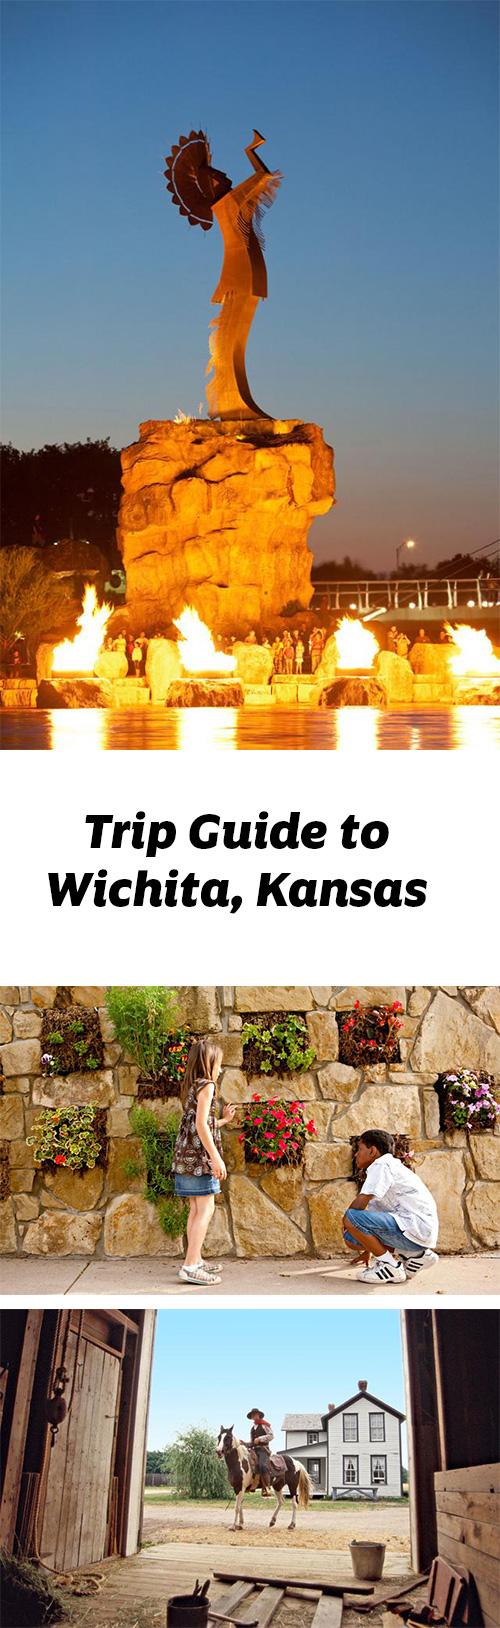 Wichita Trip Guide Midwest Travel Trip Kansas Travel